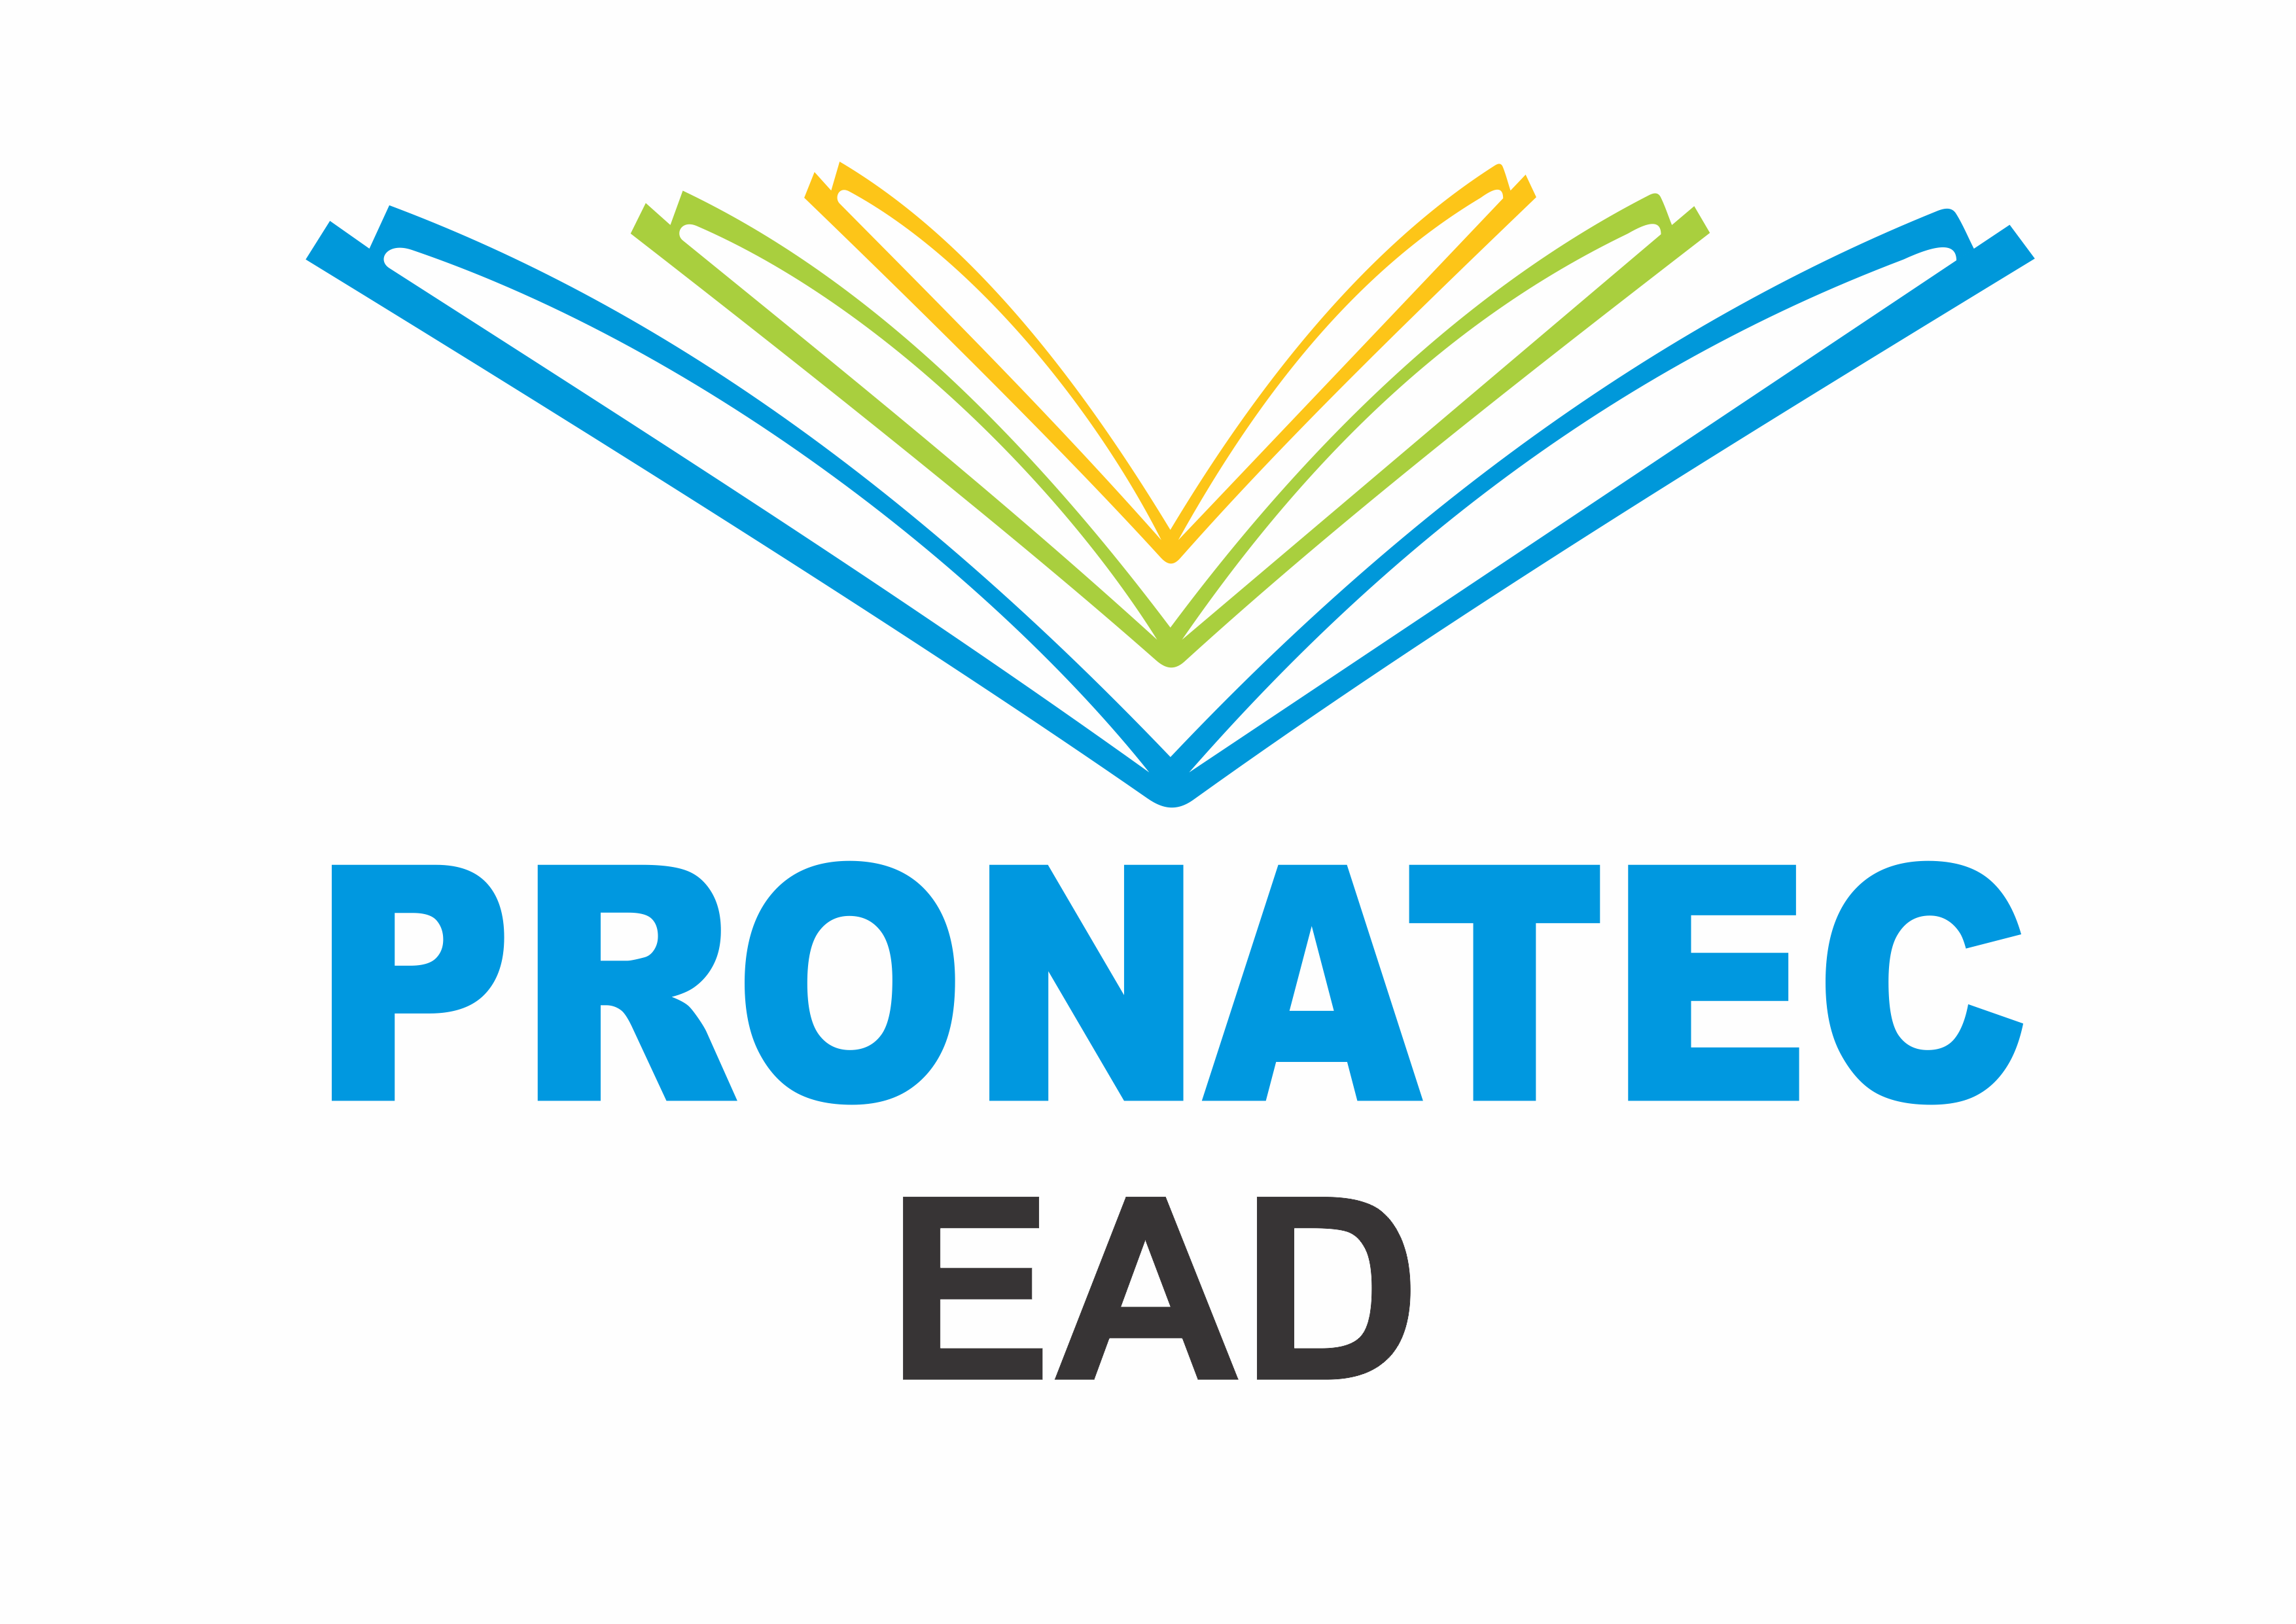 Pronatec EAD 2022